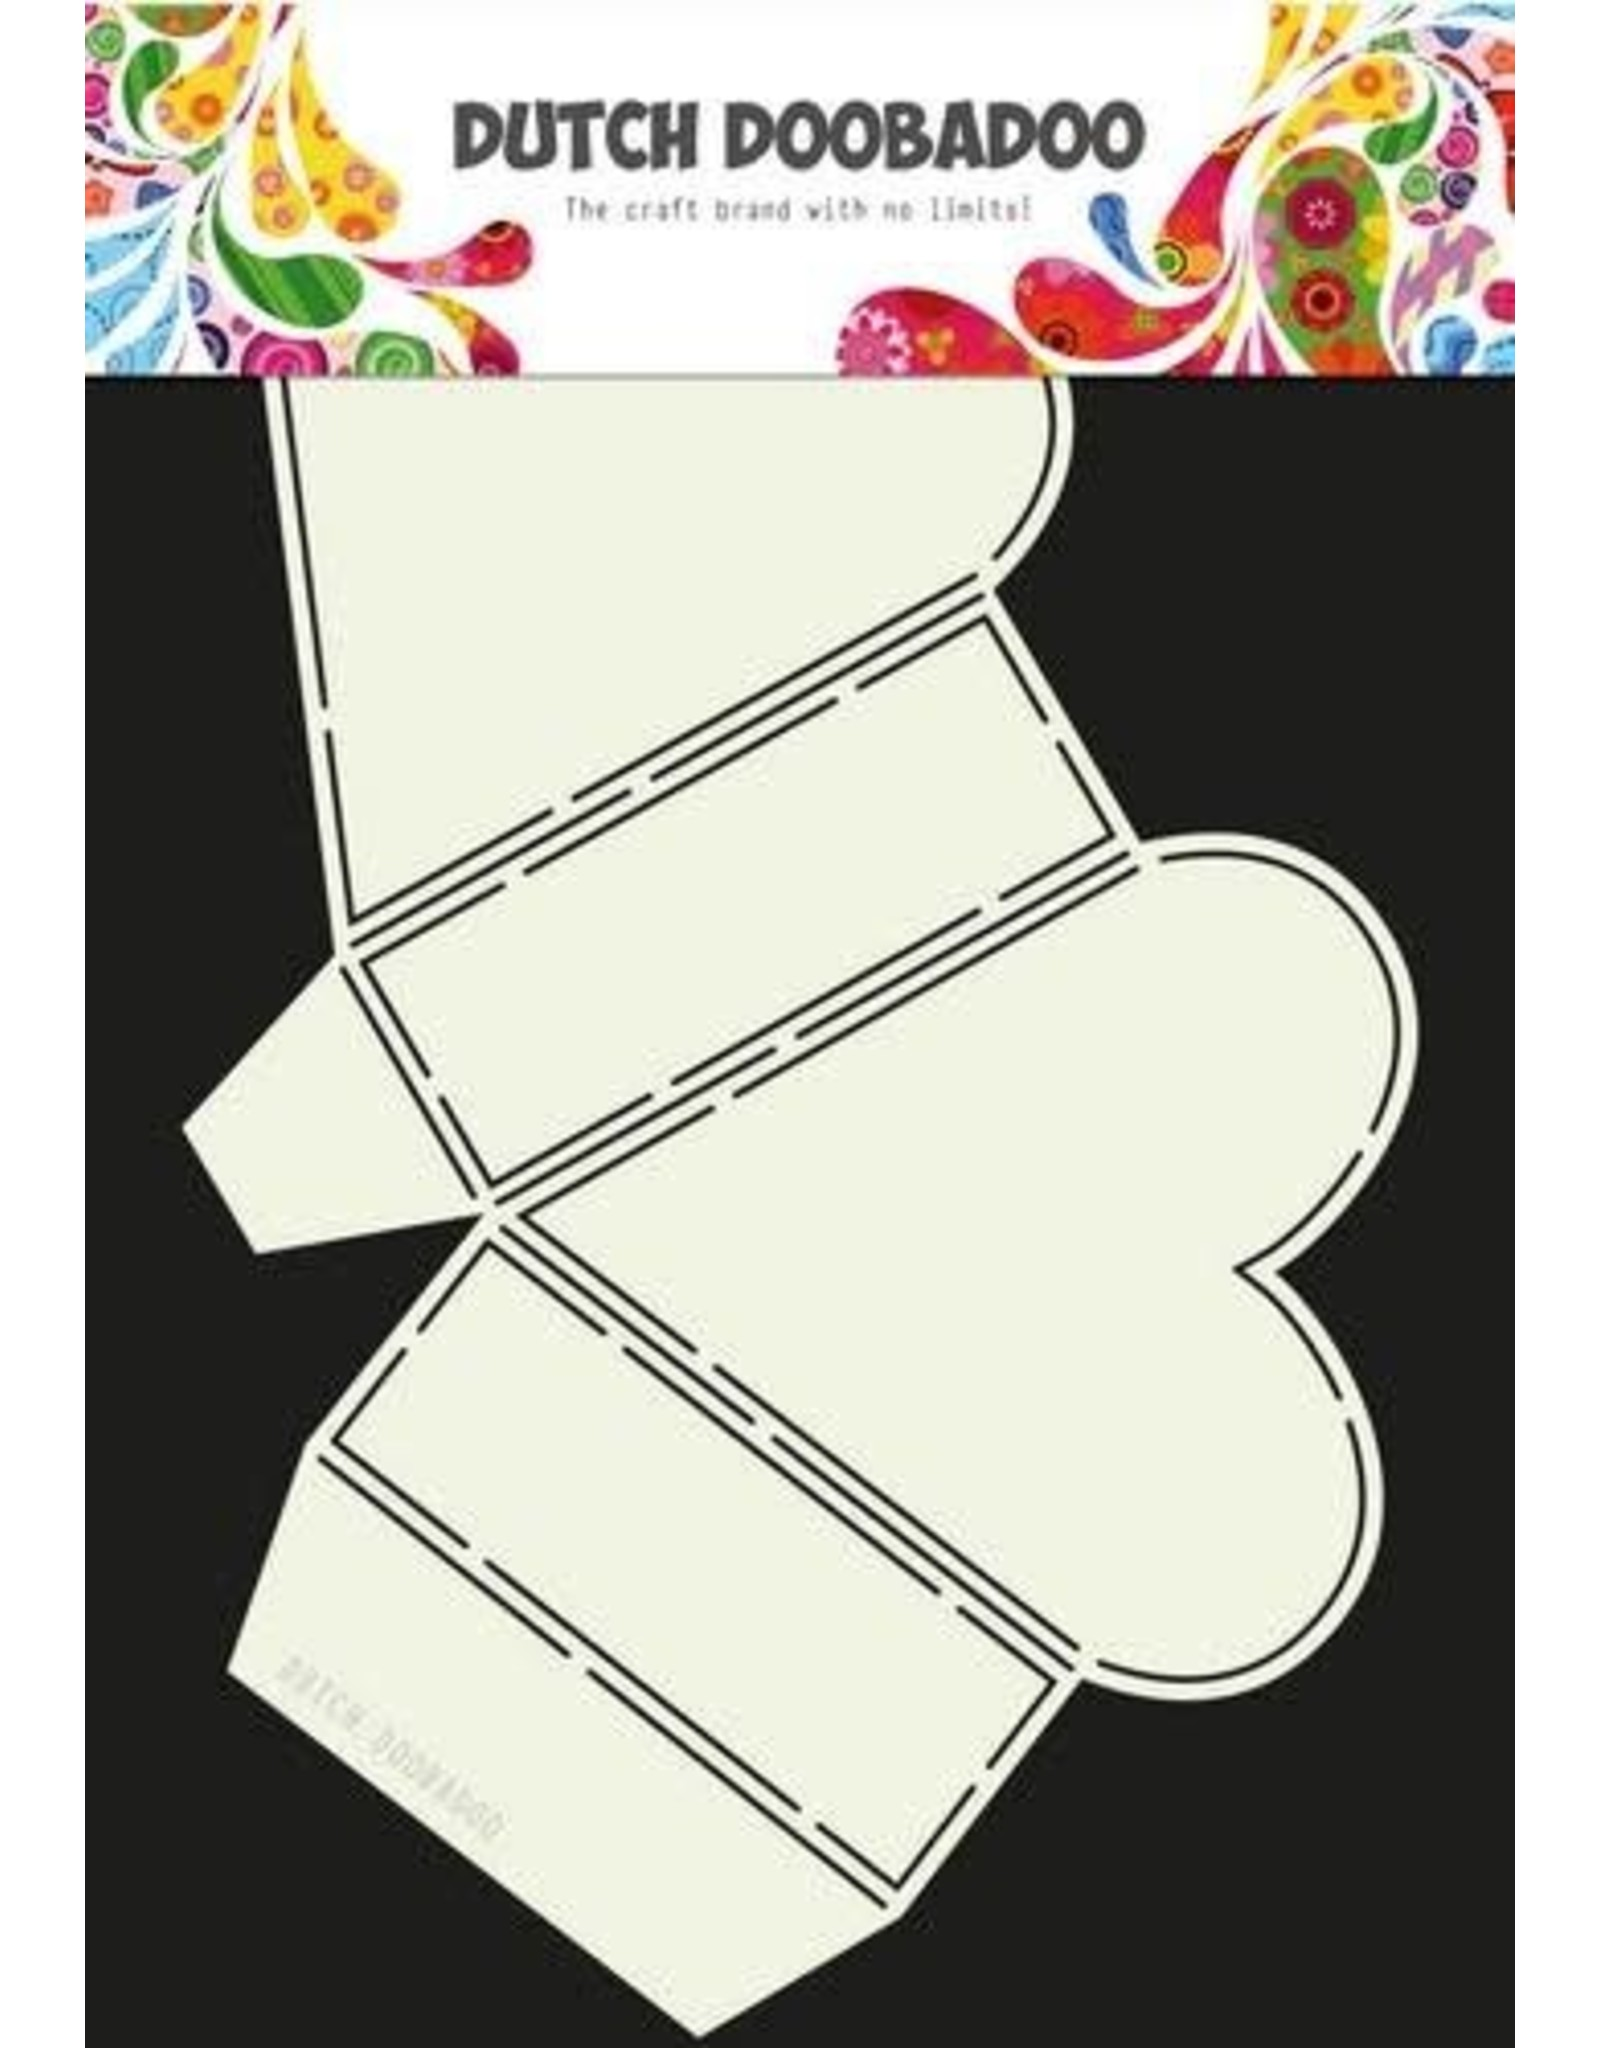 Dutch Doobadoo Box-Art Dutch Doobadoo Dutch Box Art hart 470.713.044 A4